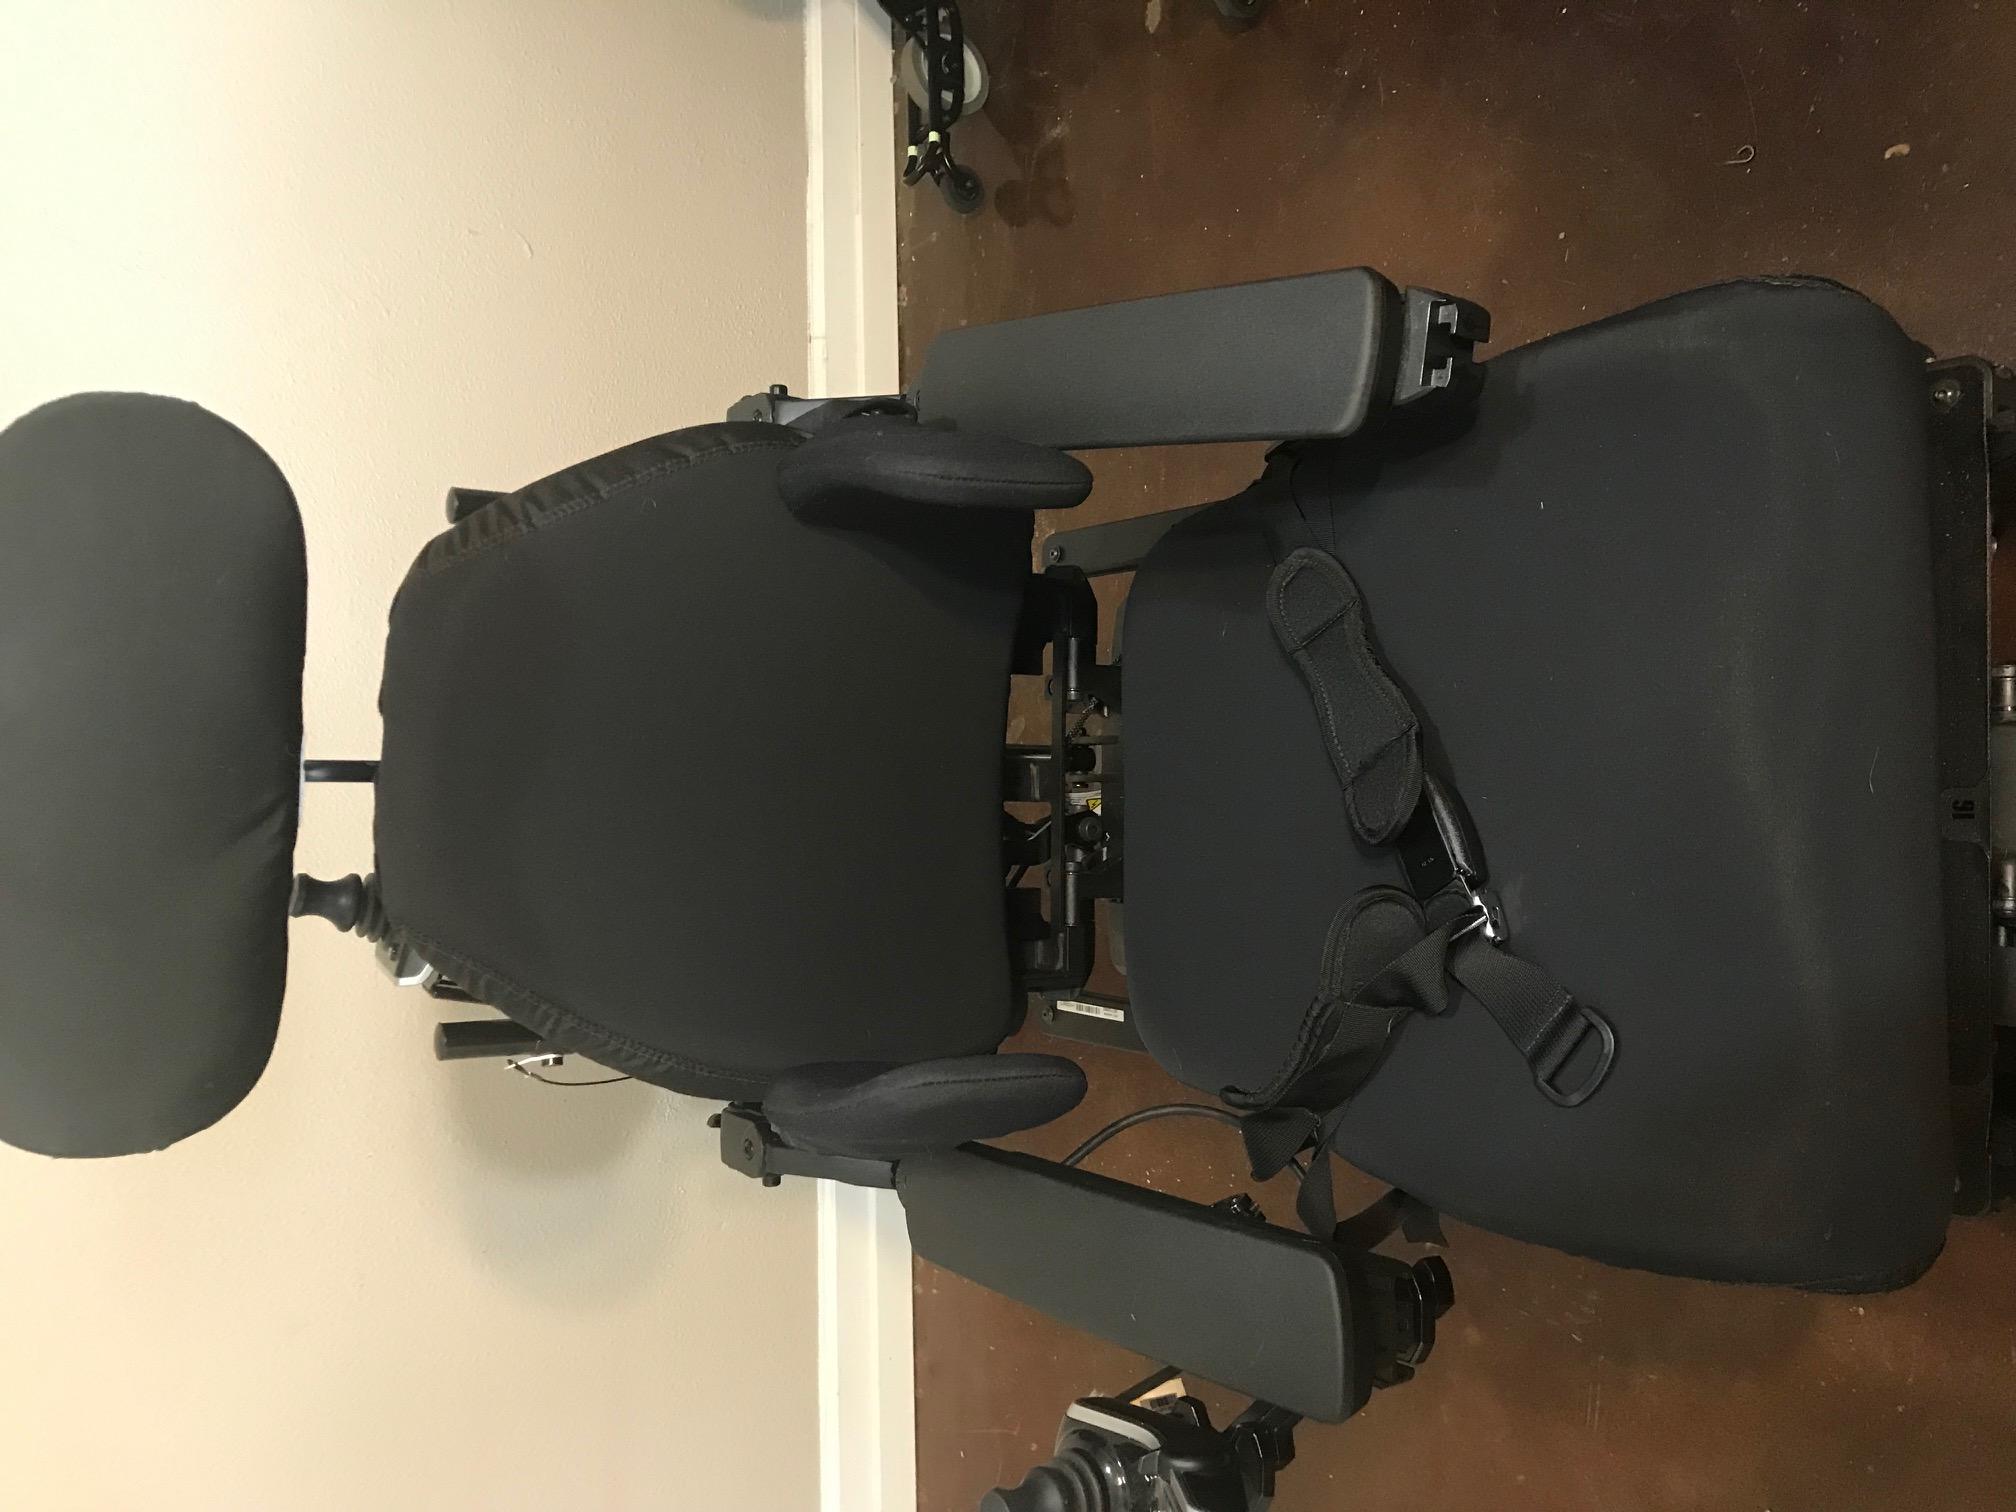 2017 Quantum Q6 Edge 2 0 Power Wheelchair Buy Amp Sell